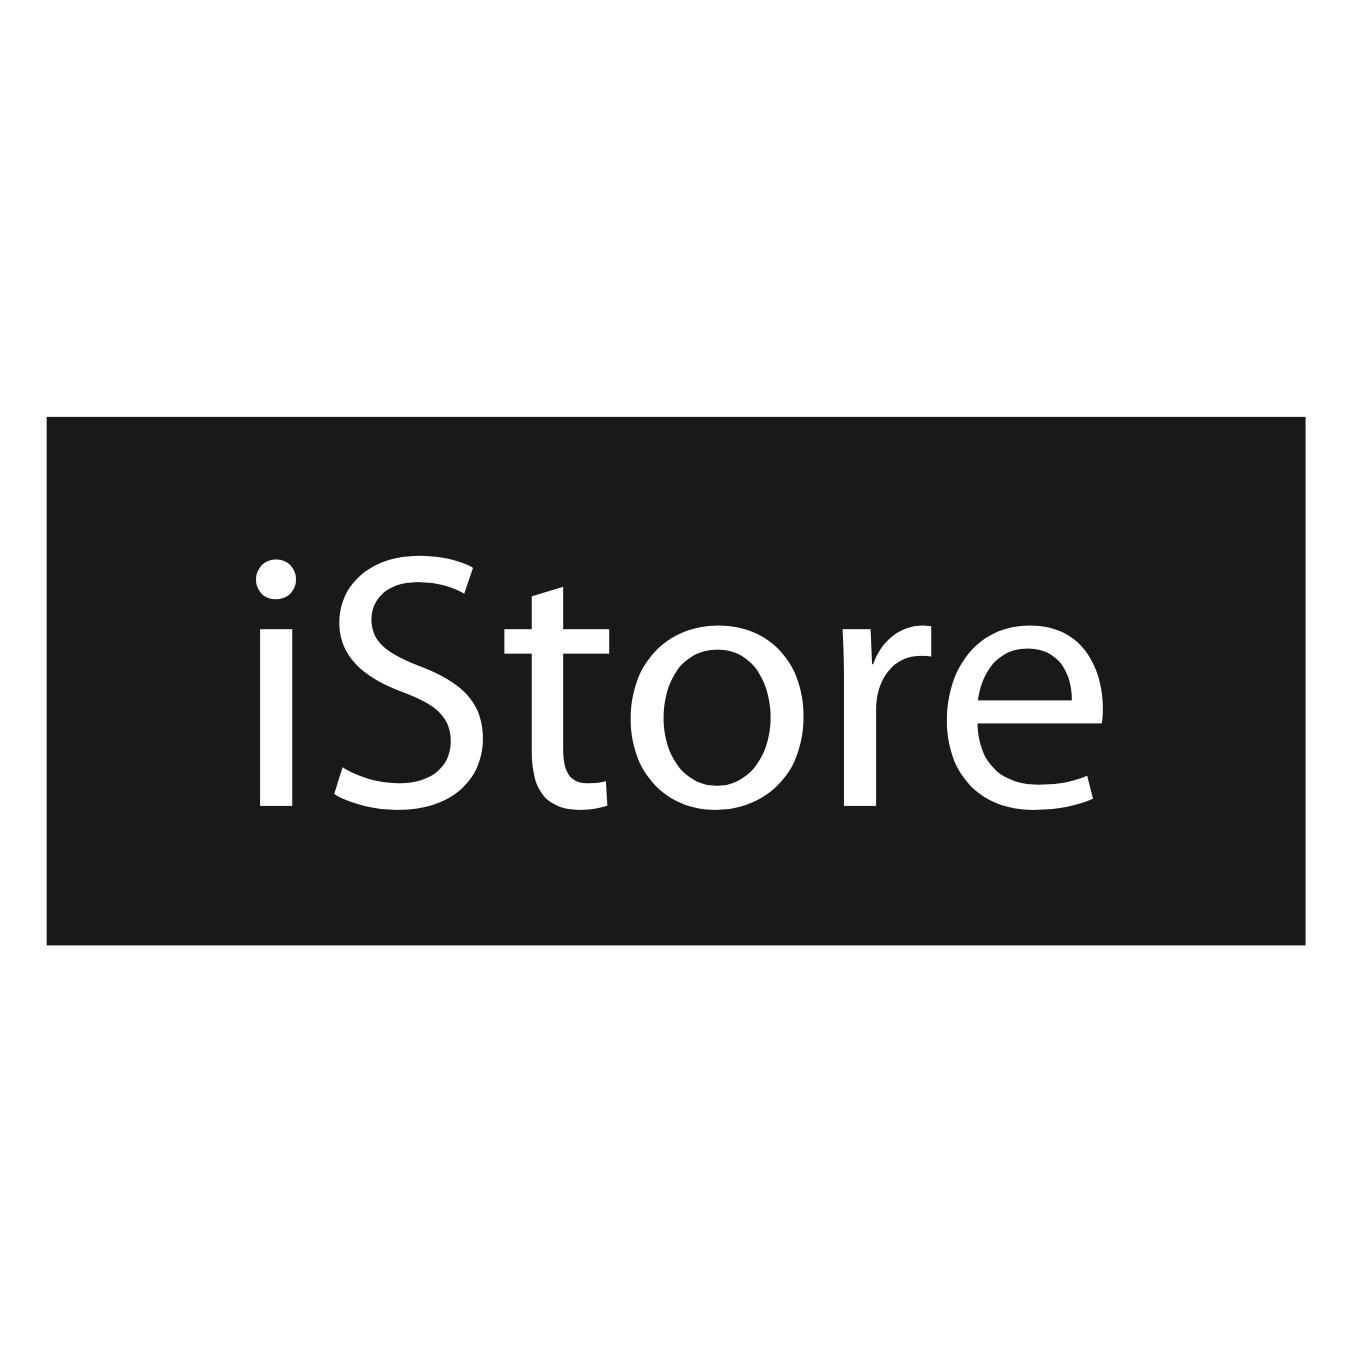 Incase Facet Case for iPhone X / Xs - Slate